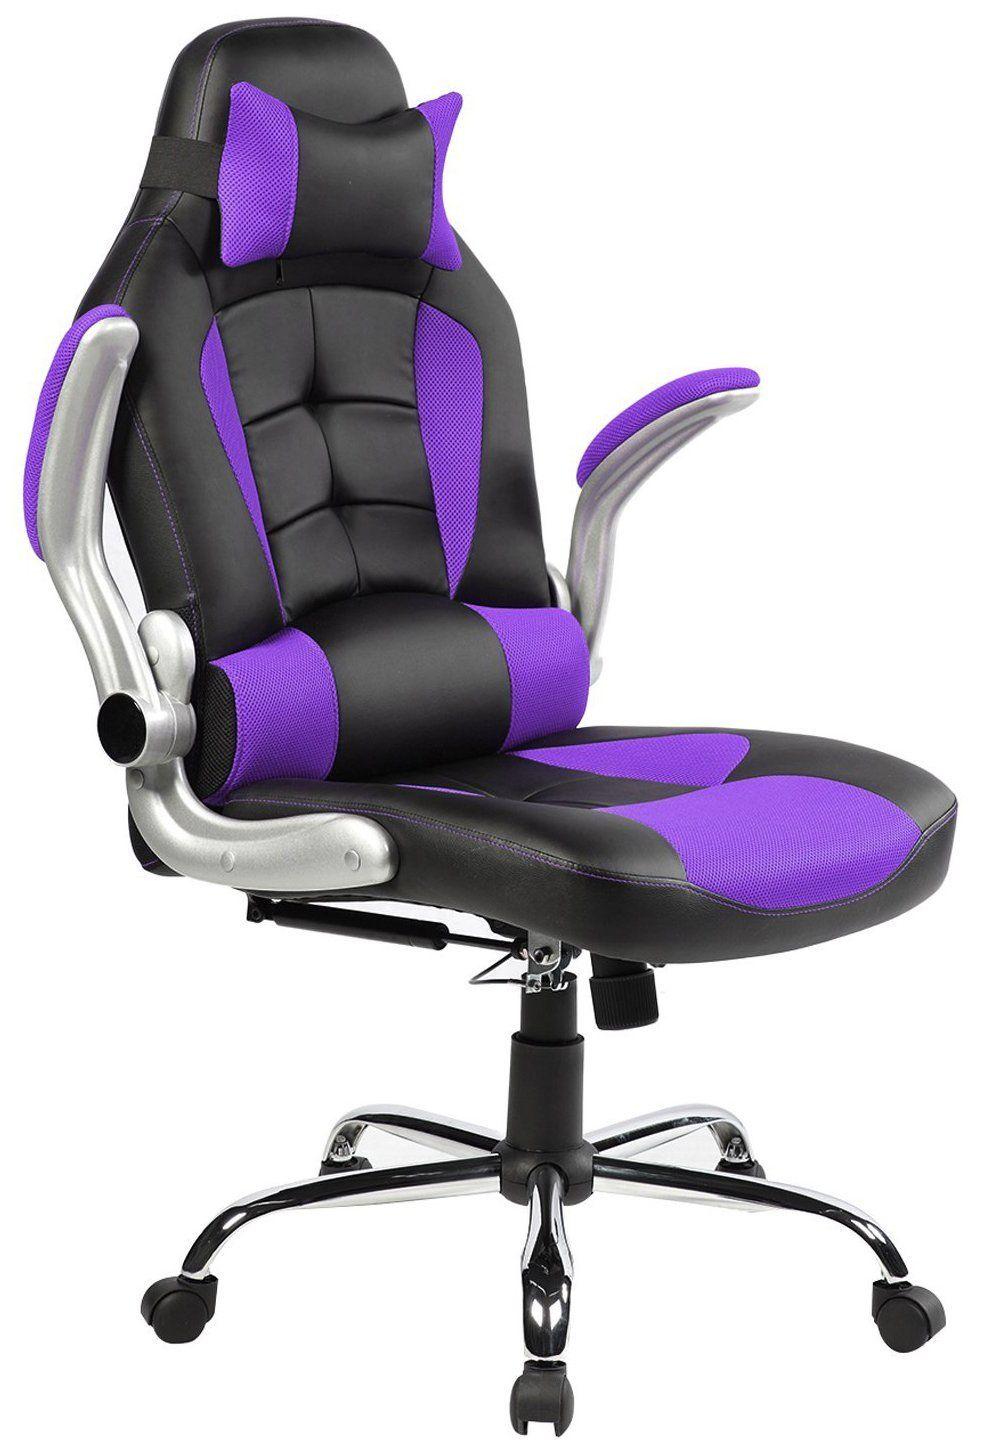 Merax King Series High Back Ergonomic Pu Leather Office Chair Racing Style Swivel Chair Computer Desk Lumbar Su Leather Office Chair Chair Headrest